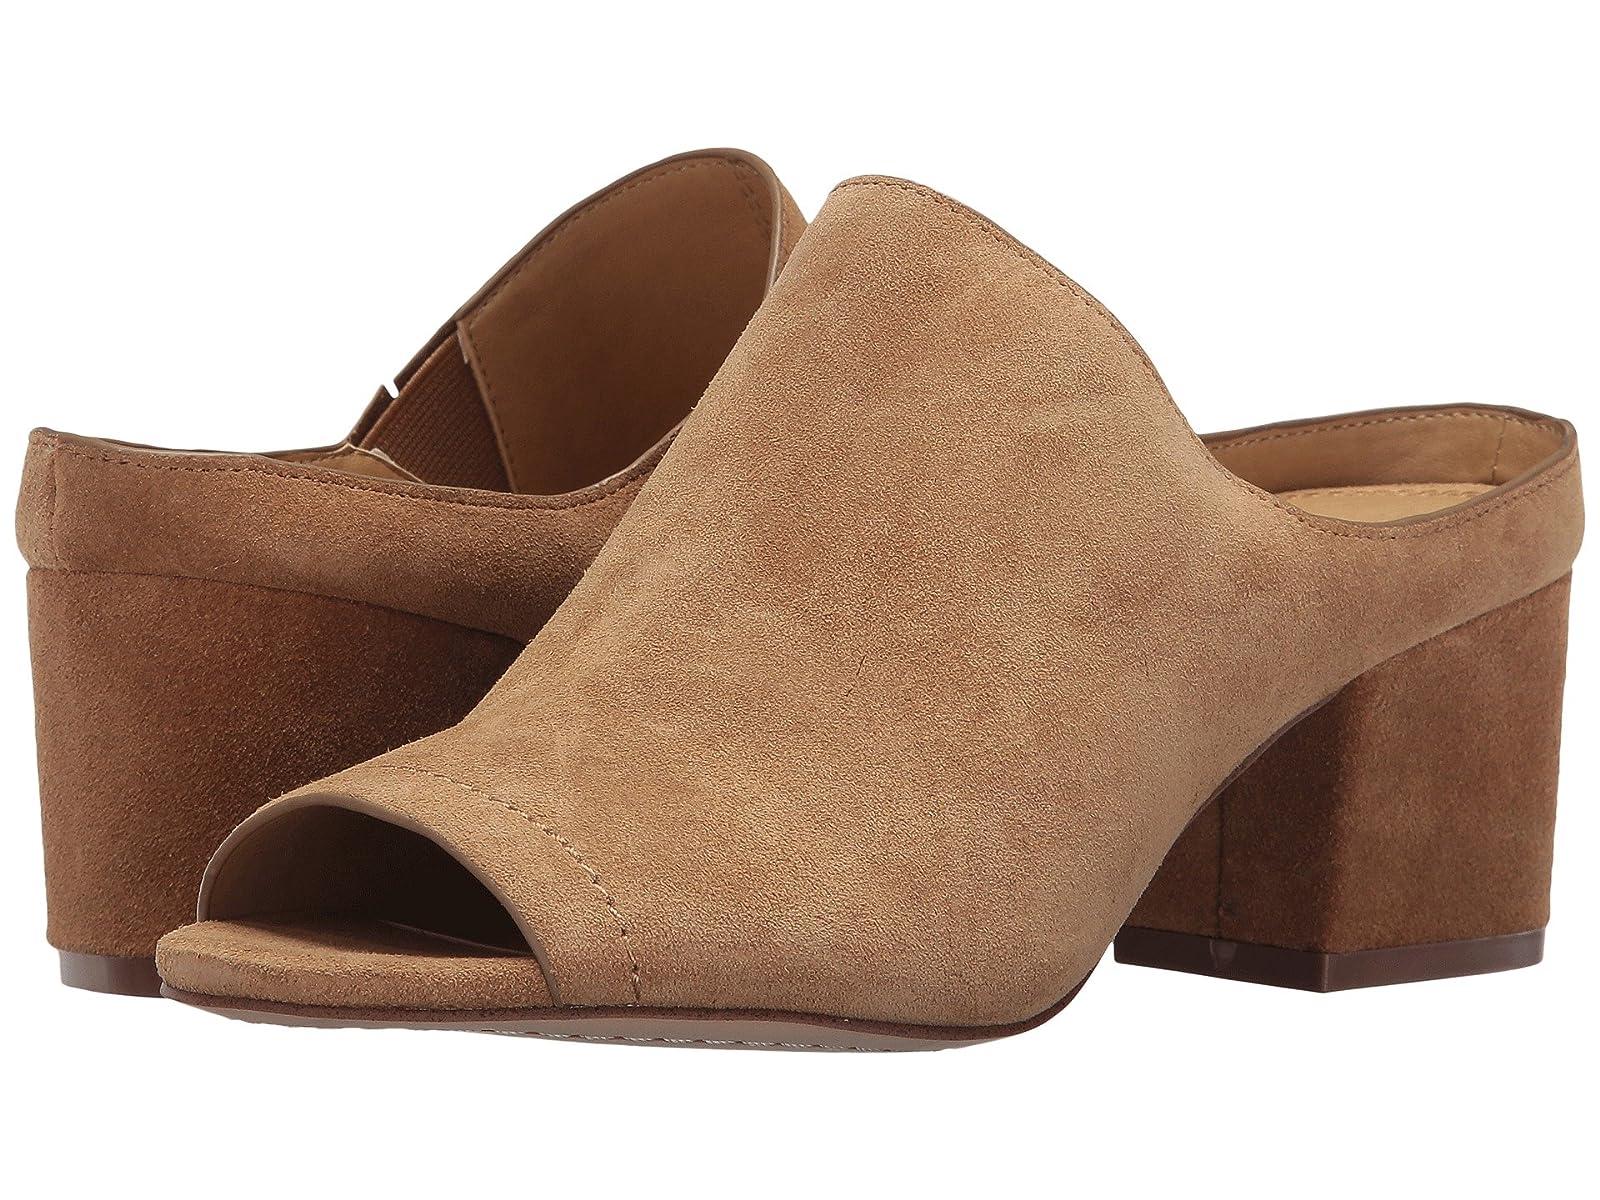 Splendid DanicaCheap and distinctive eye-catching shoes